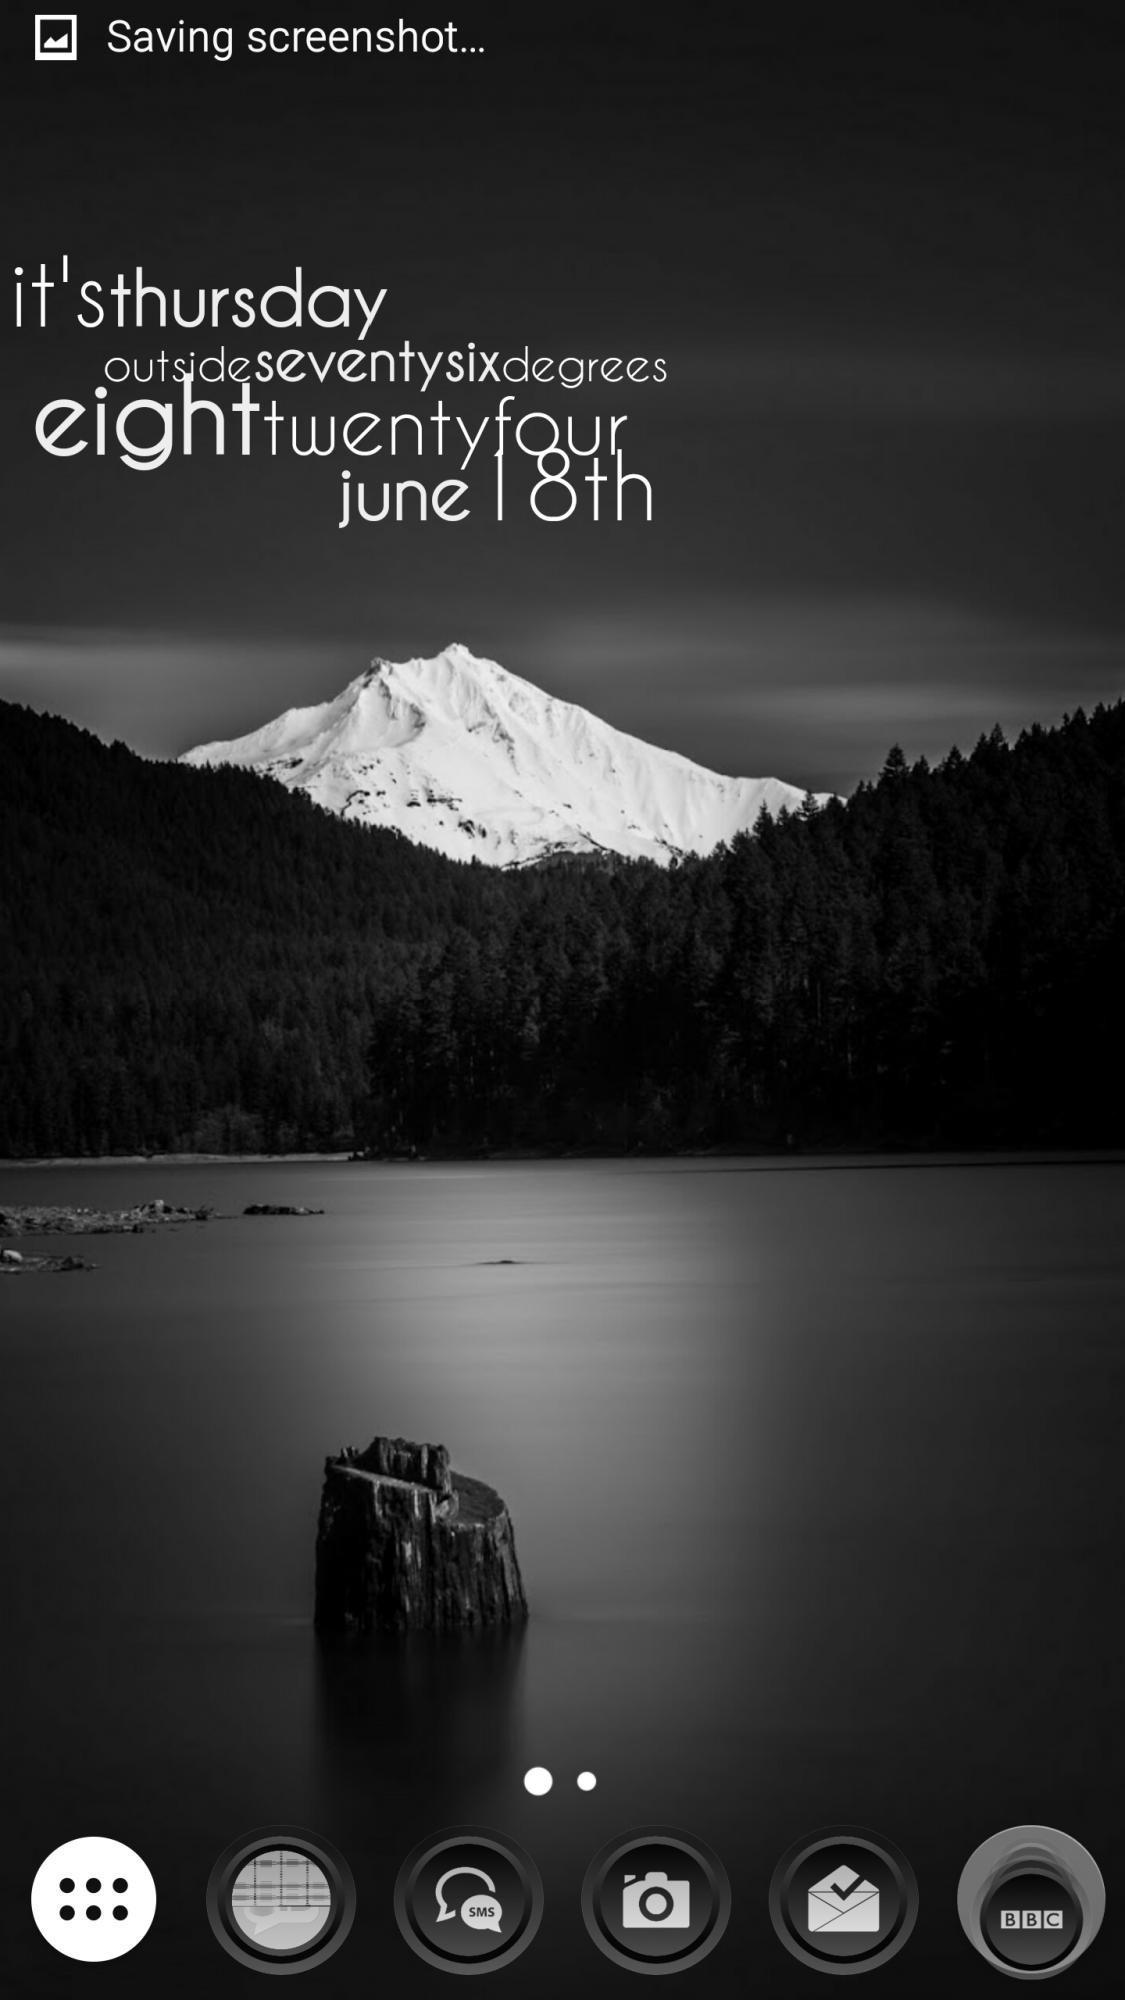 Screenshot_2015-06-18-08-24-19.png